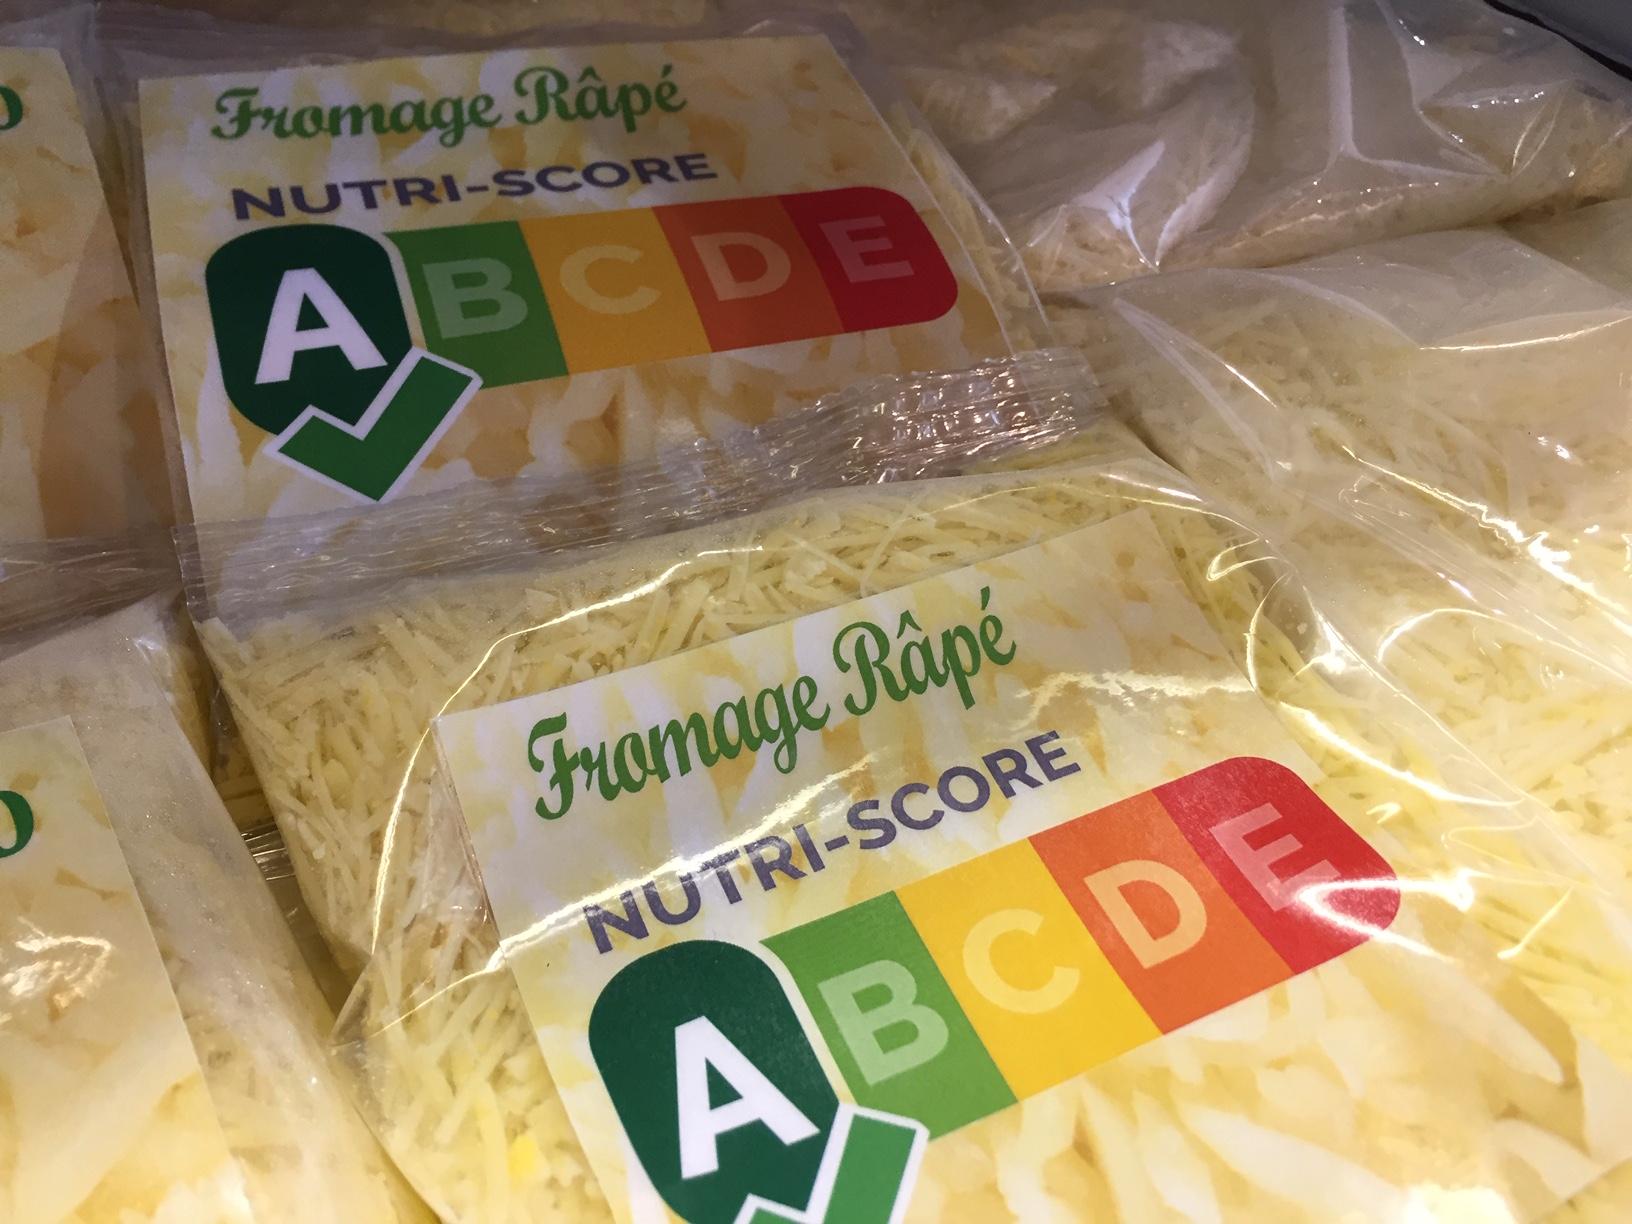 Nutri-score label kaas